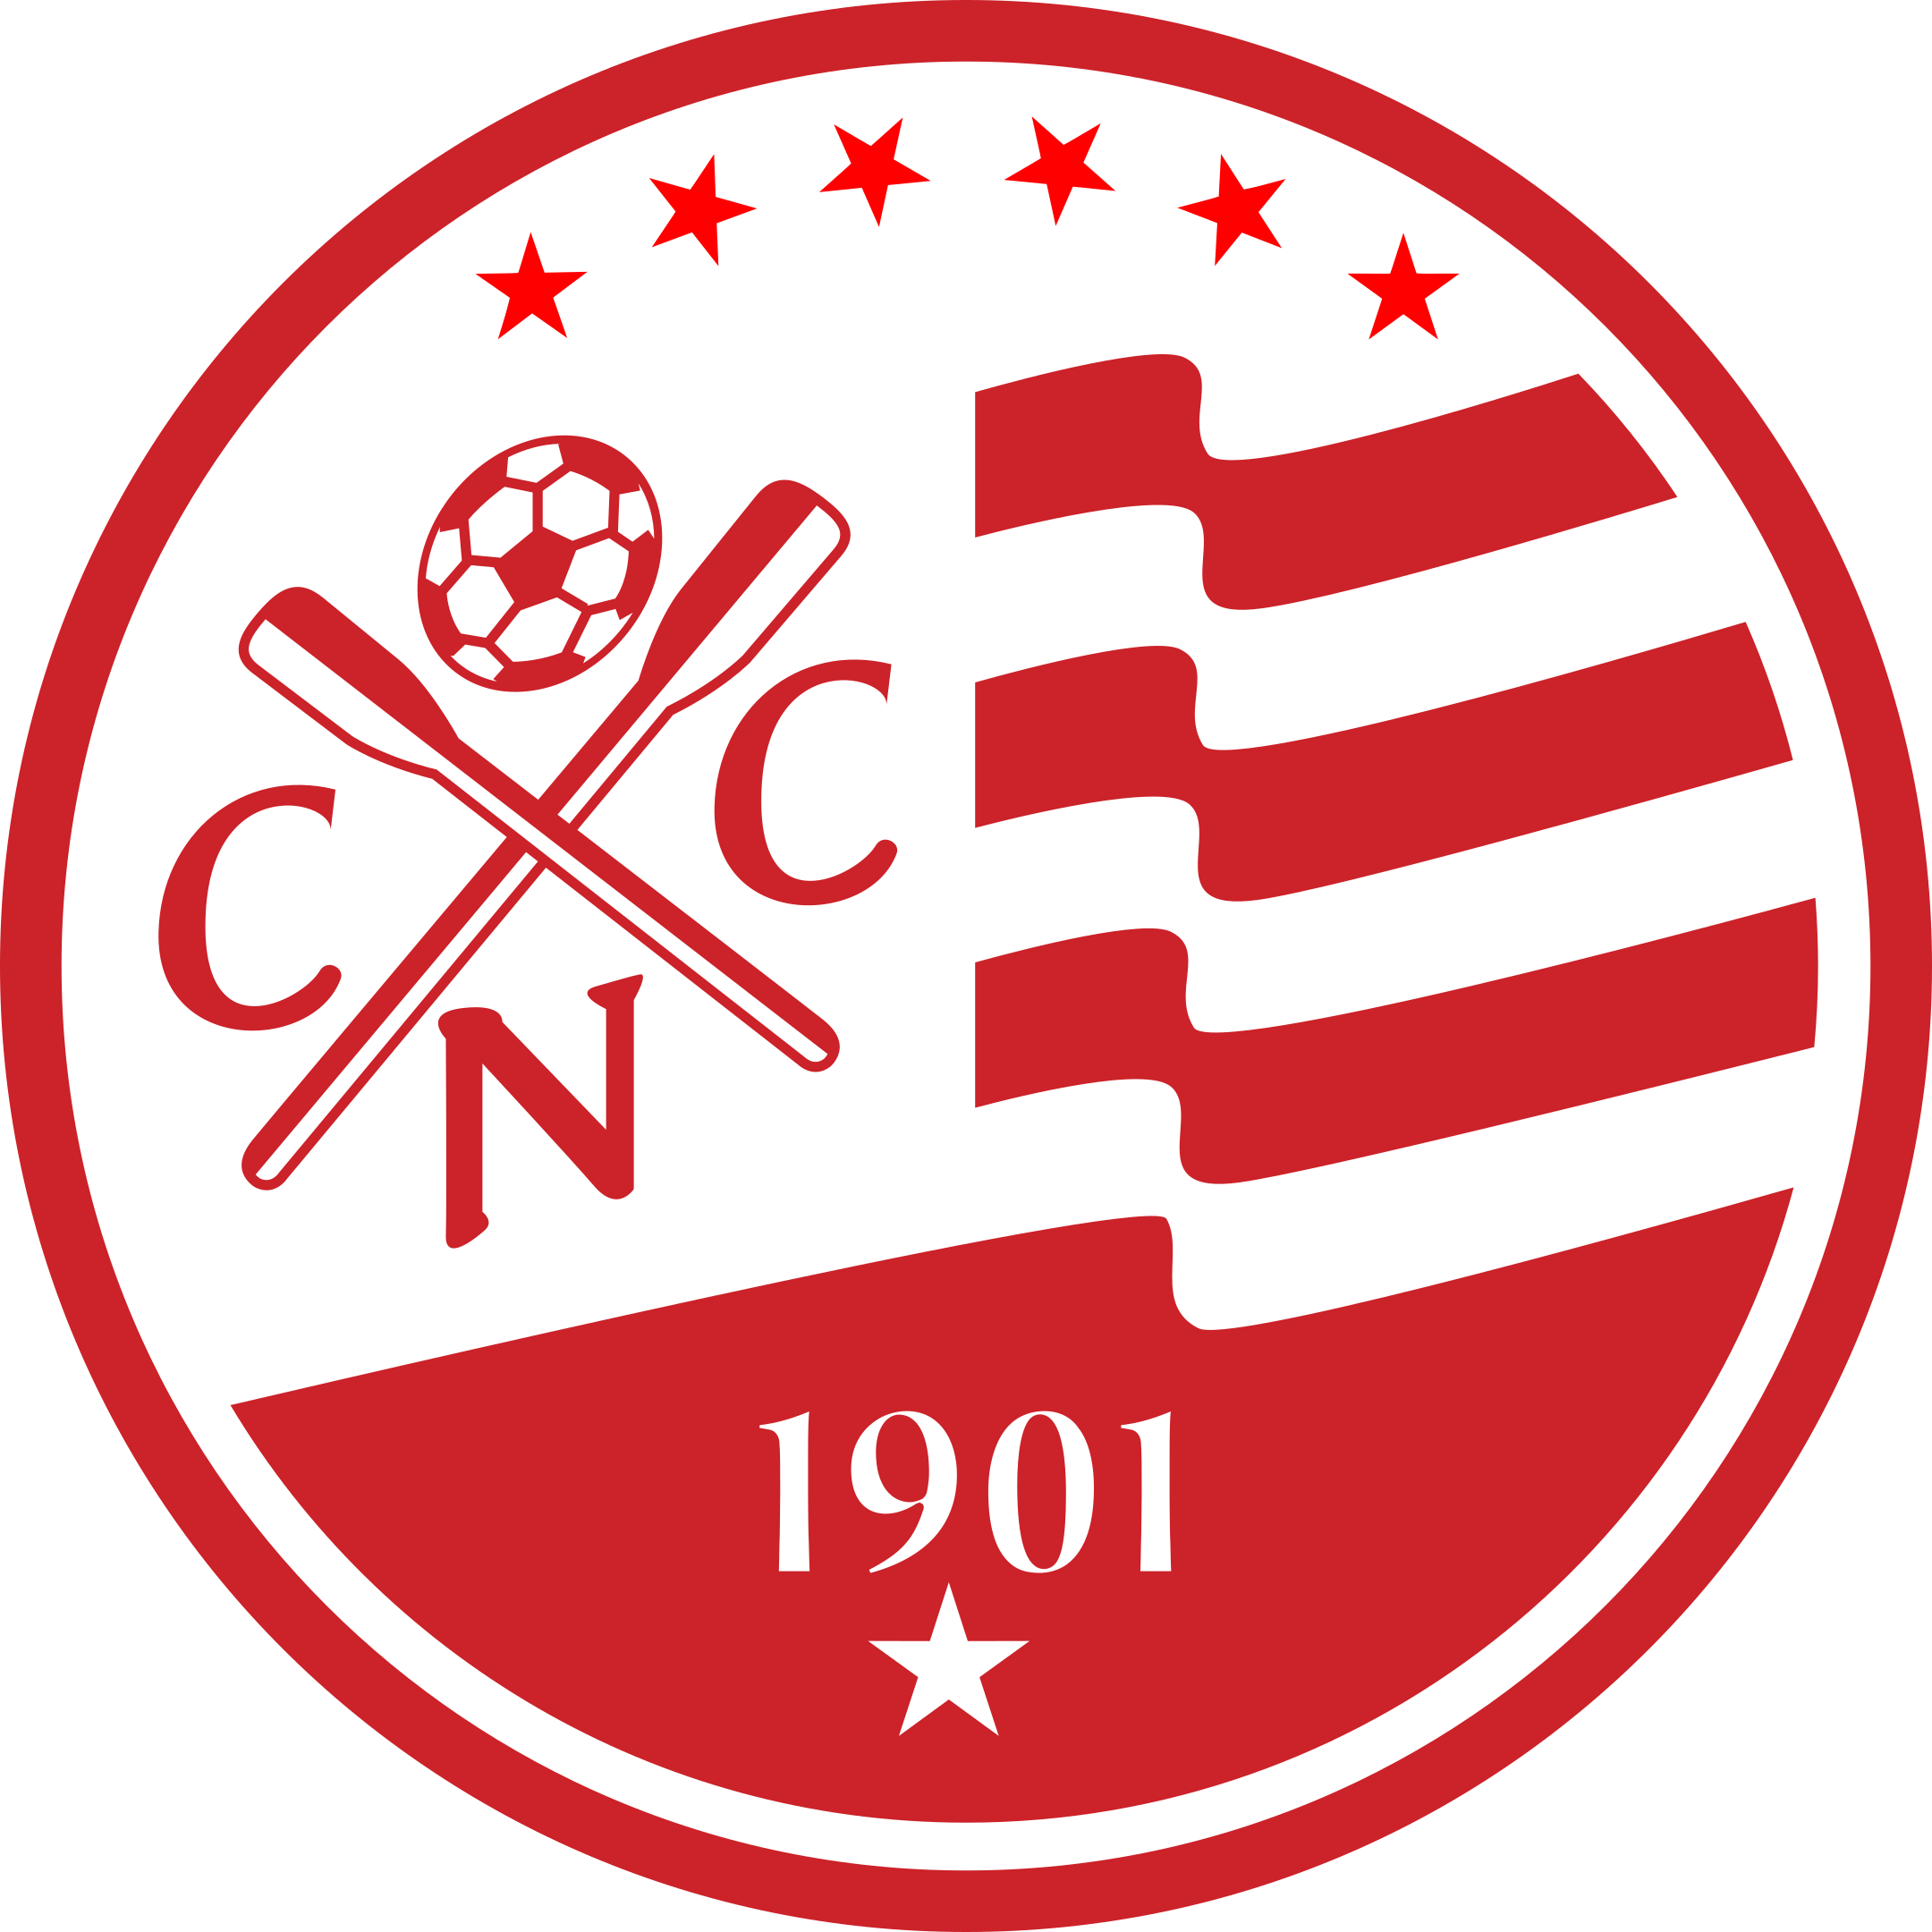 nautico logo 1 - Náutico Logo (Brazil)